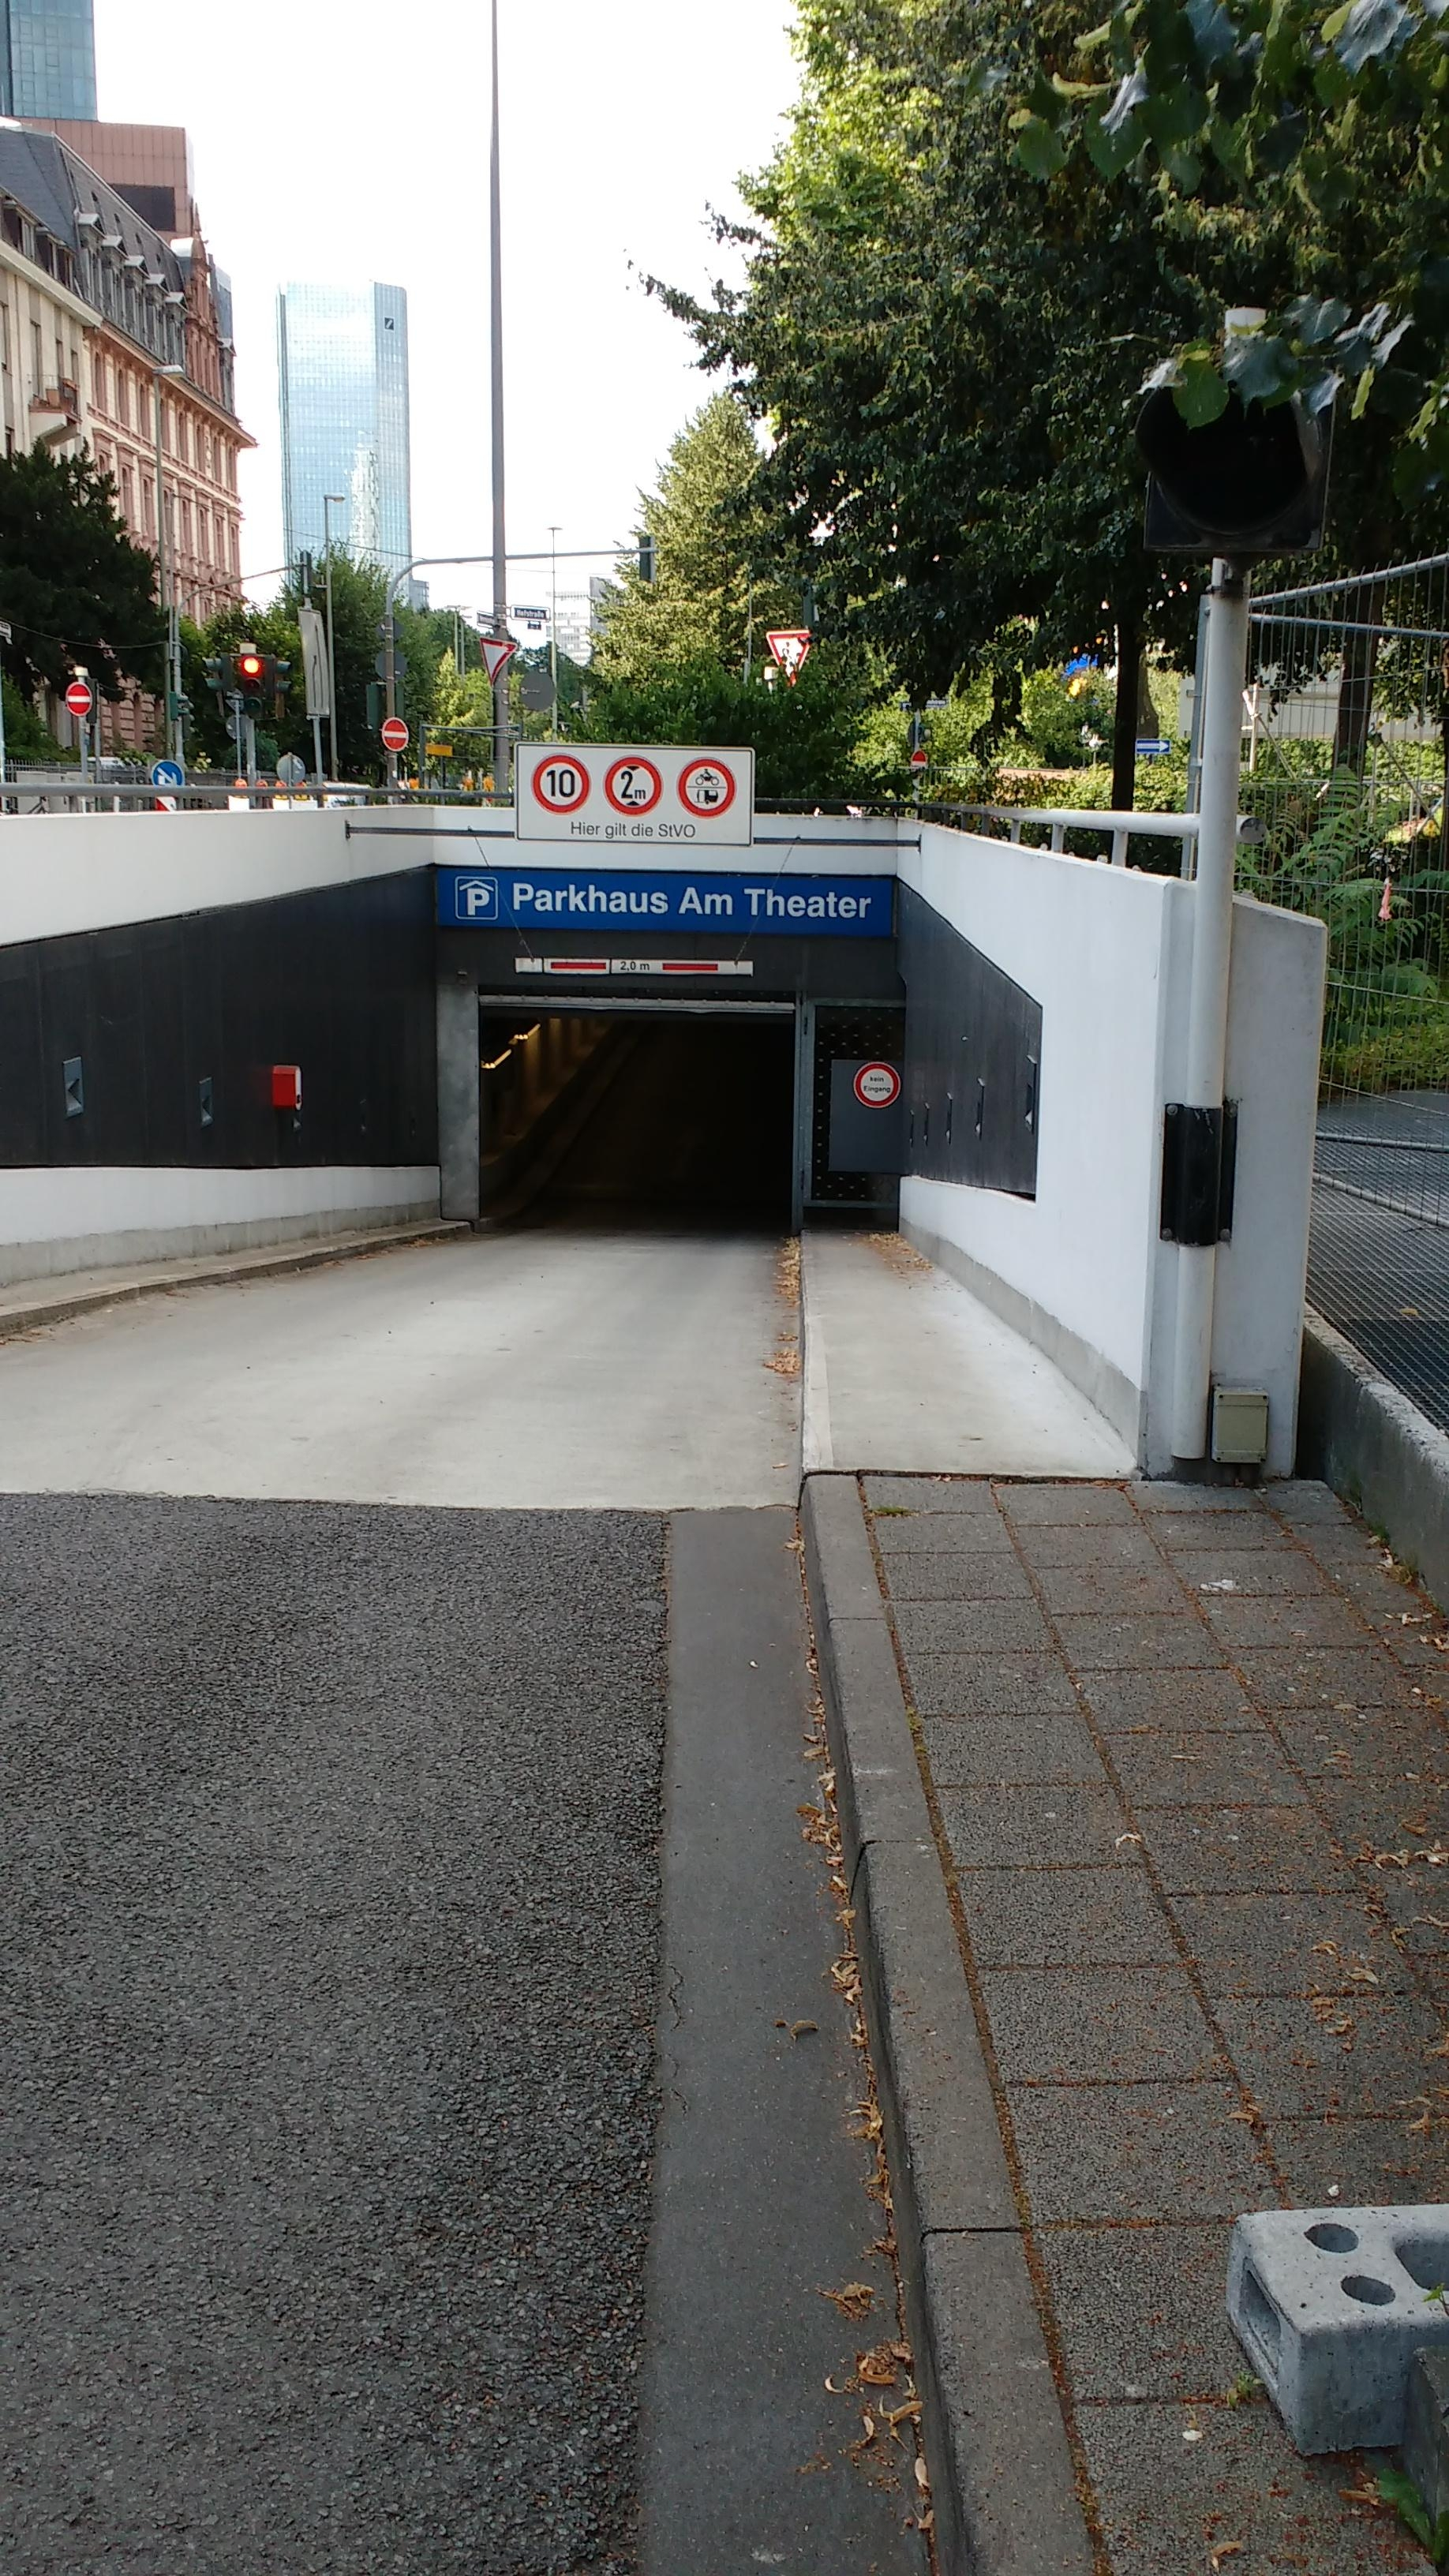 Parkhaus Untermainanlage